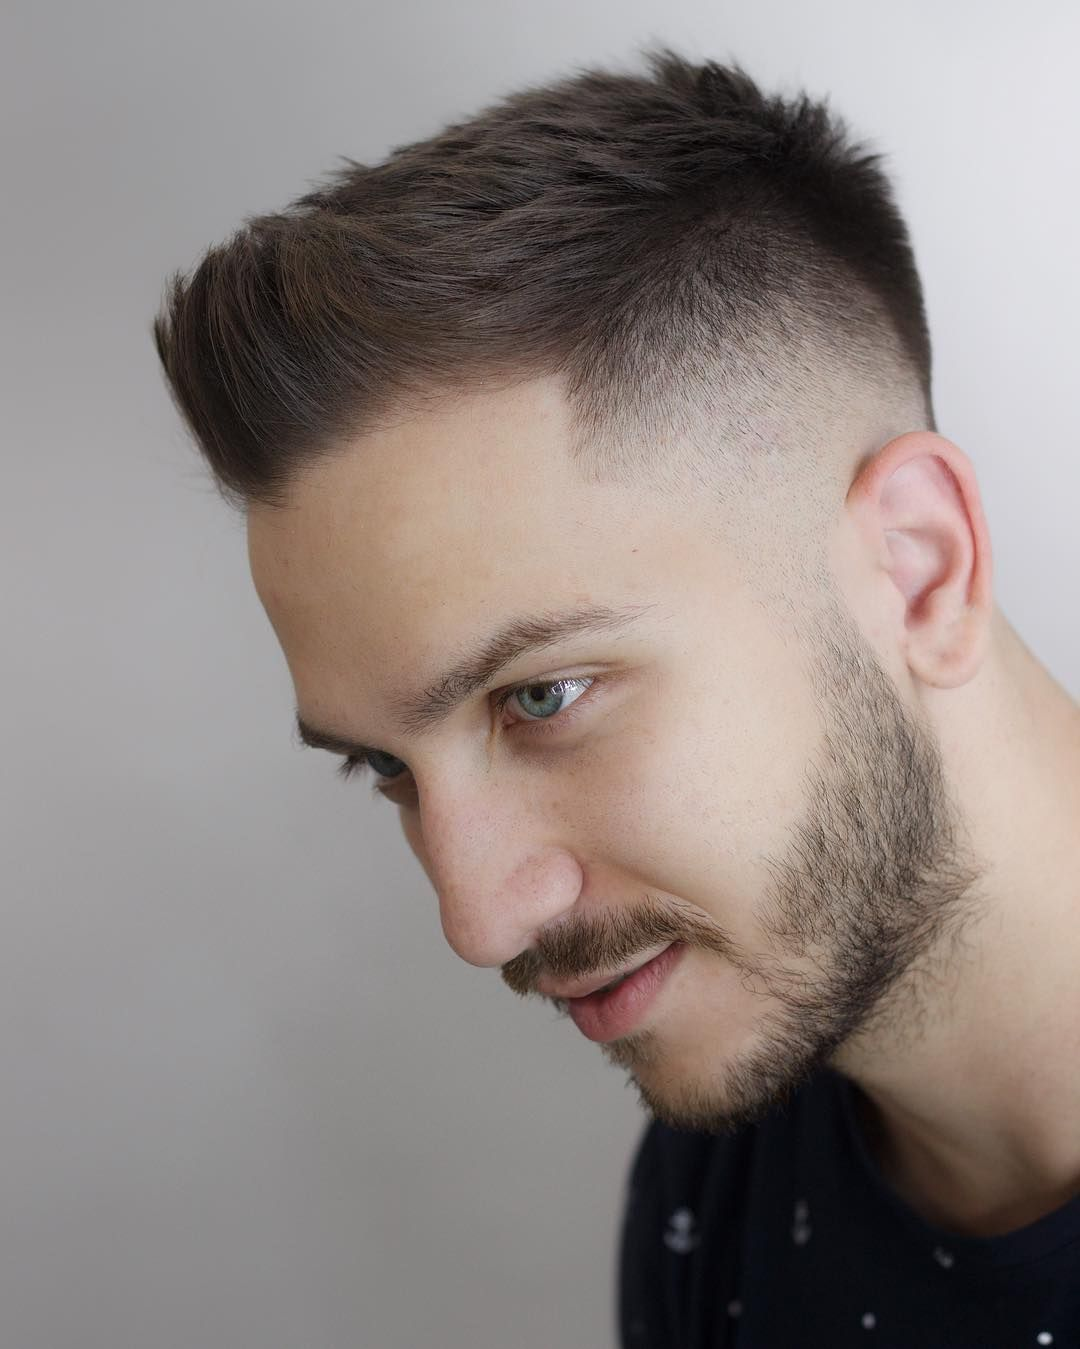 Boy haircuts taper mens haircuts  top  u pro barber tipsmens haircuts  top